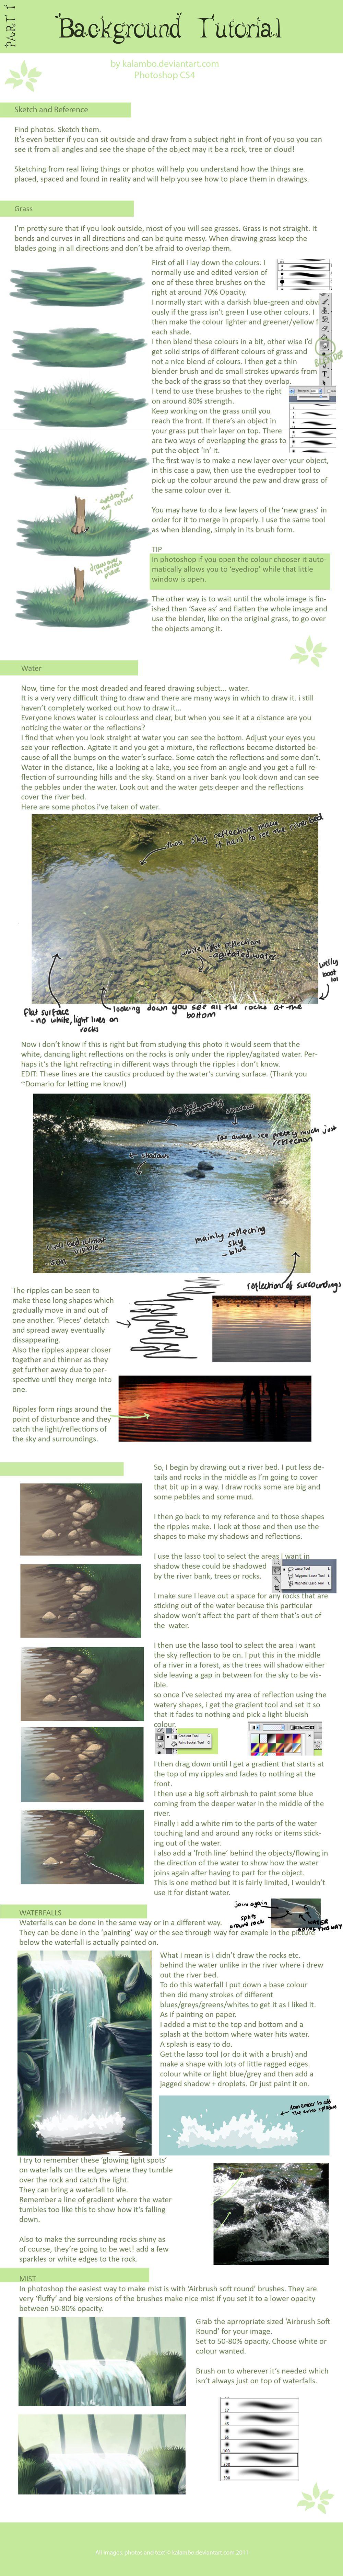 Background tutorial - Part 1 by *kalambo on deviantART